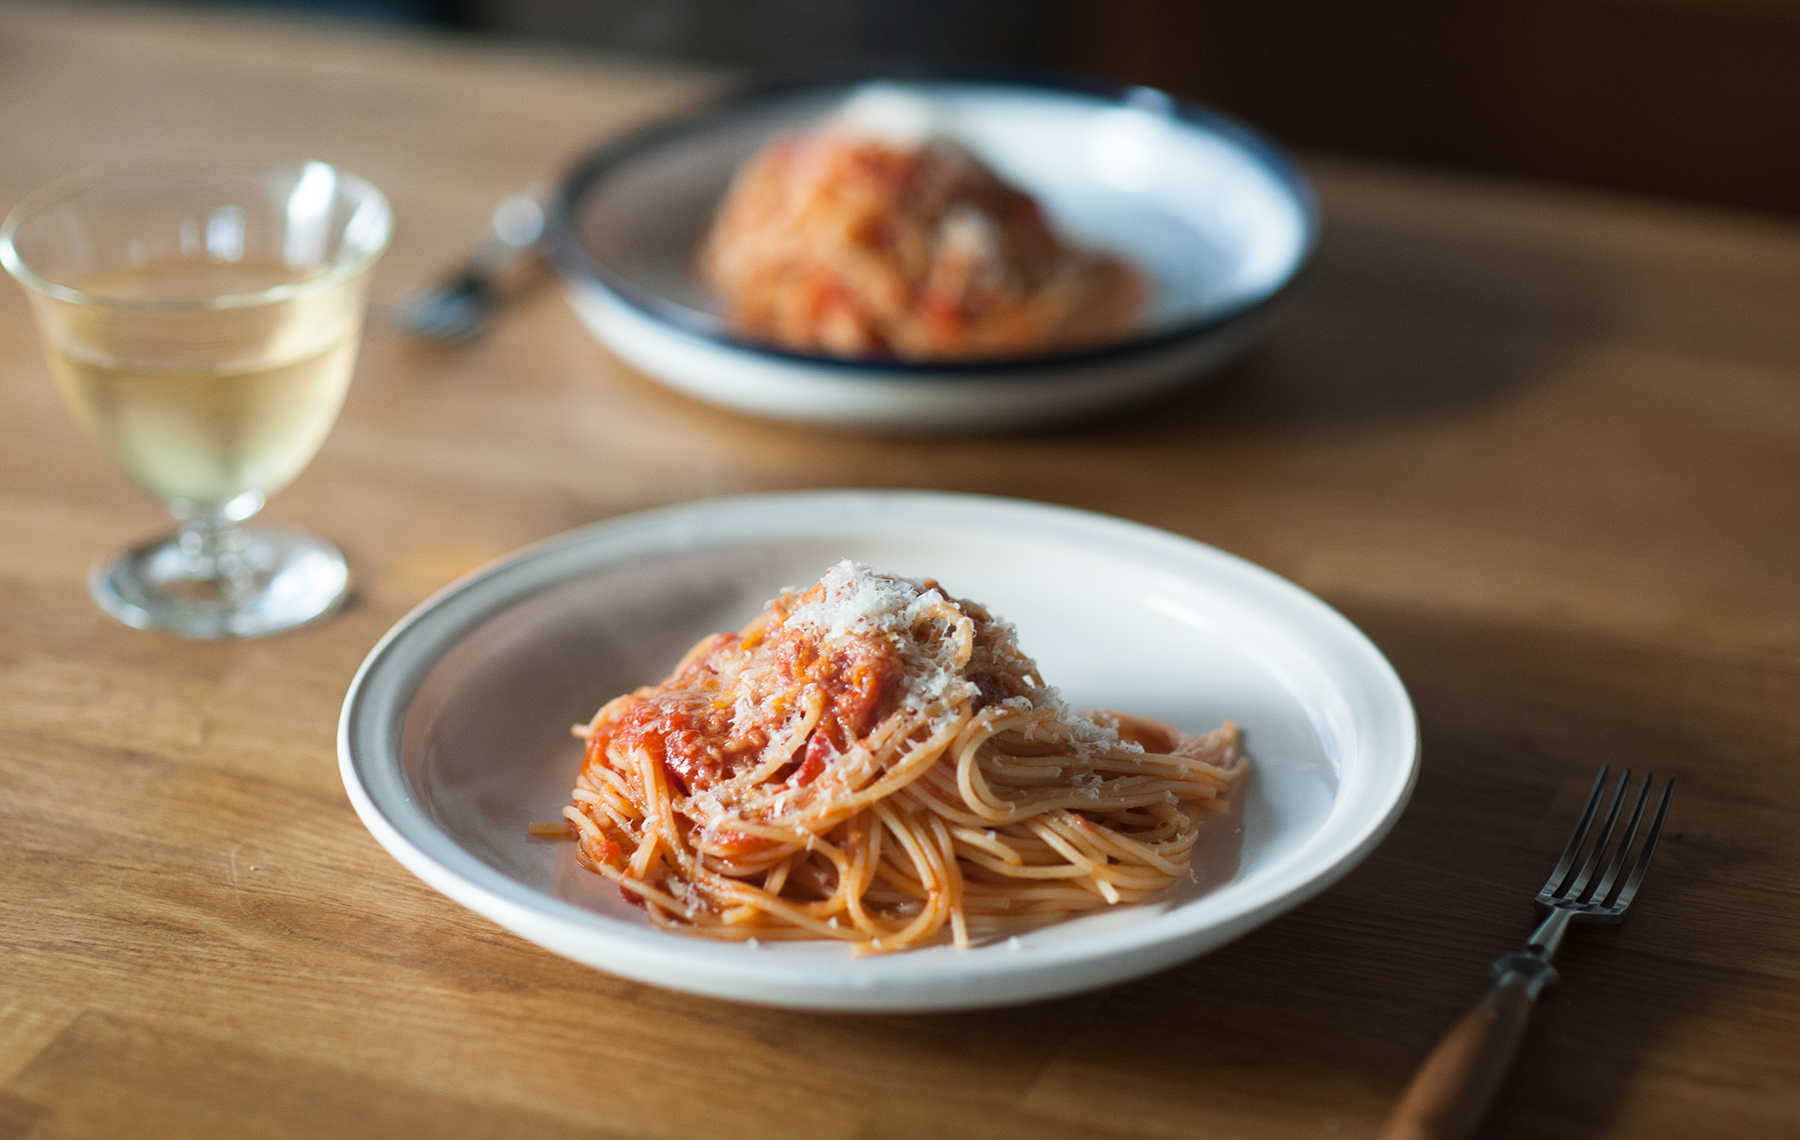 AltaMed pasta